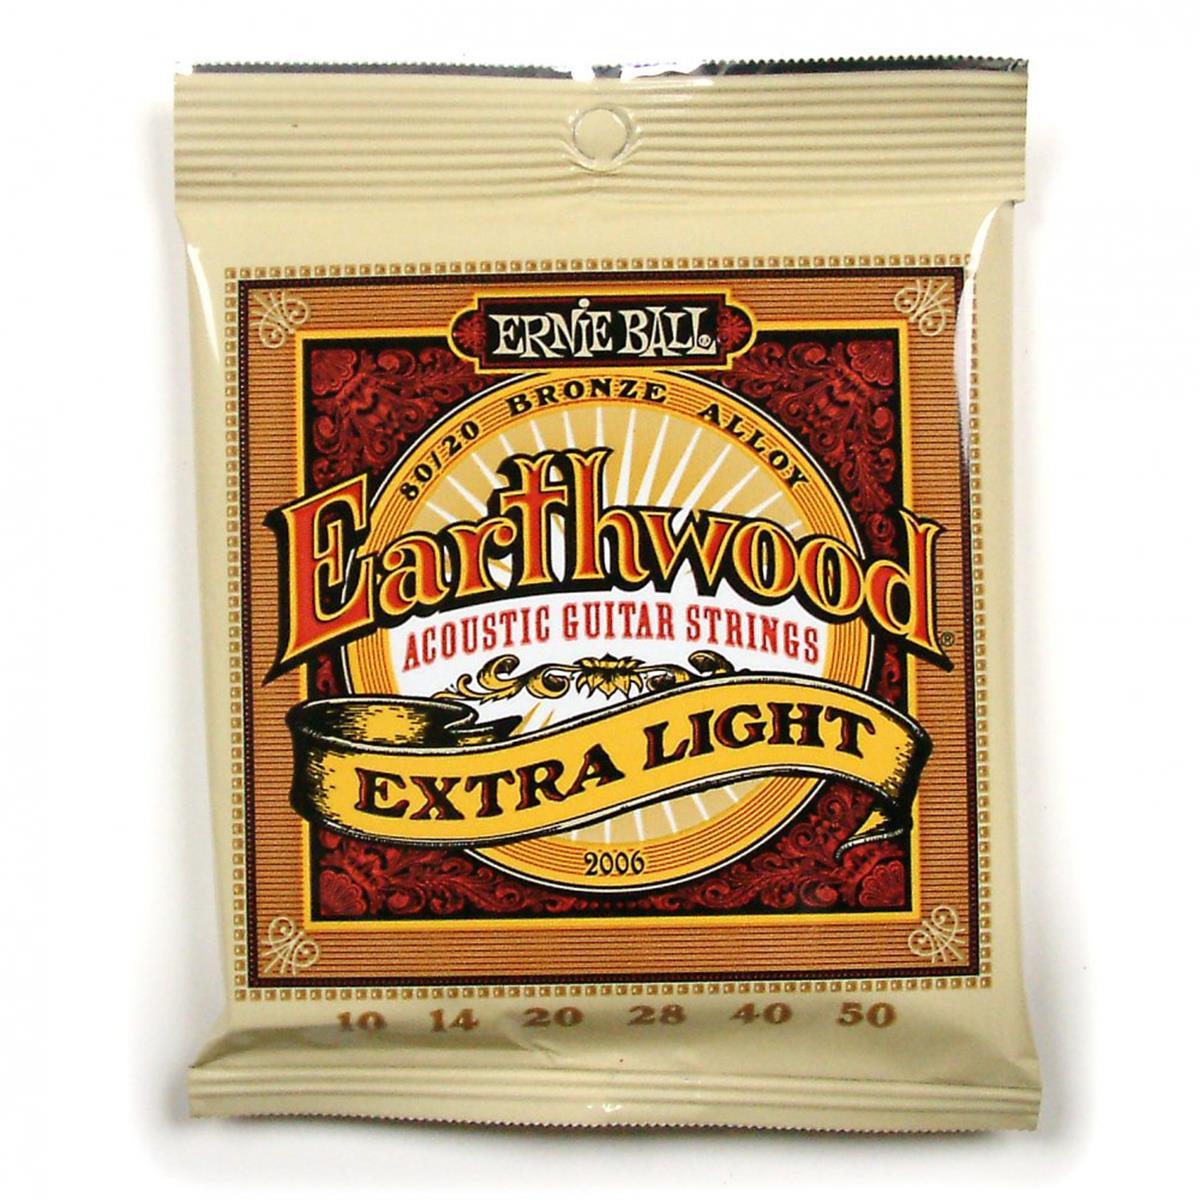 ERNIE-BALL-2006-CORDE-ACUSTICA-10-Earthwood-Extra-Light-sku-6822